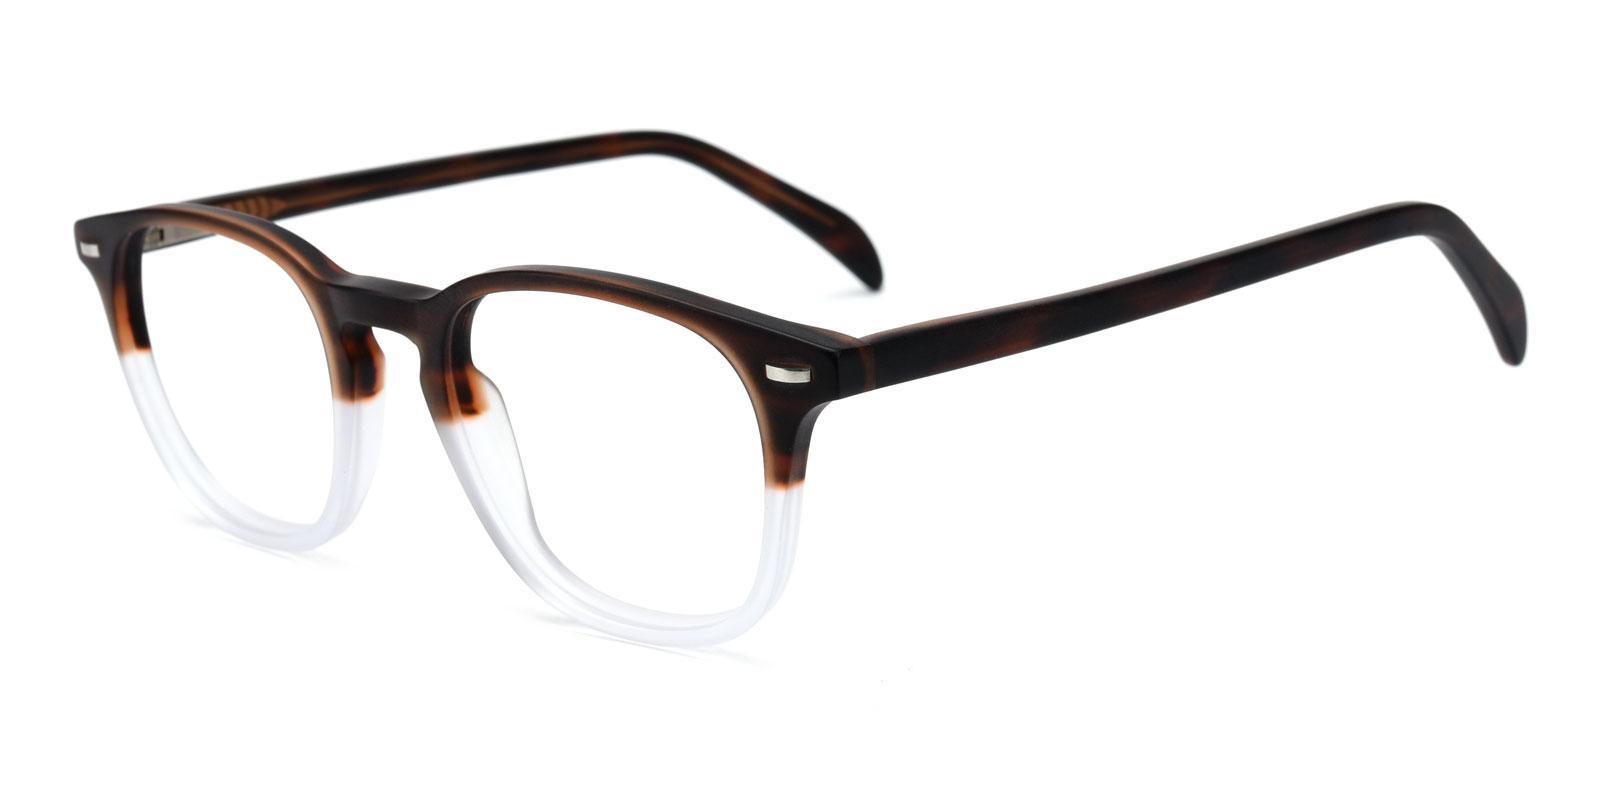 Bamboo-Brown-Rectangle-TR-Eyeglasses-detail